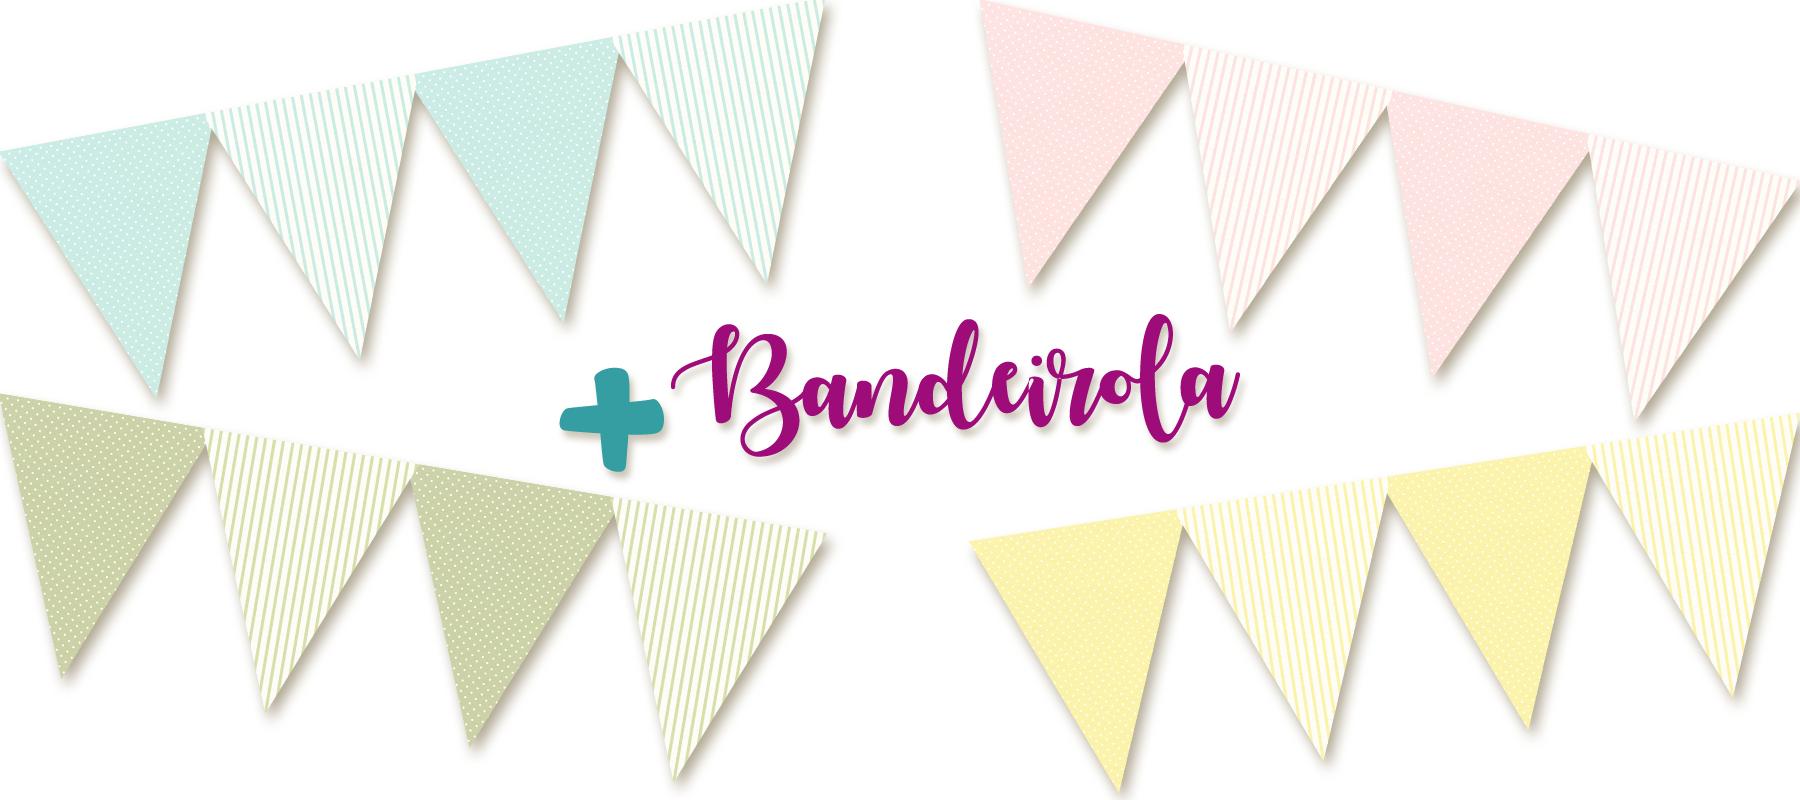 Bandeirola-pra-batizado-kit-digital-batizado